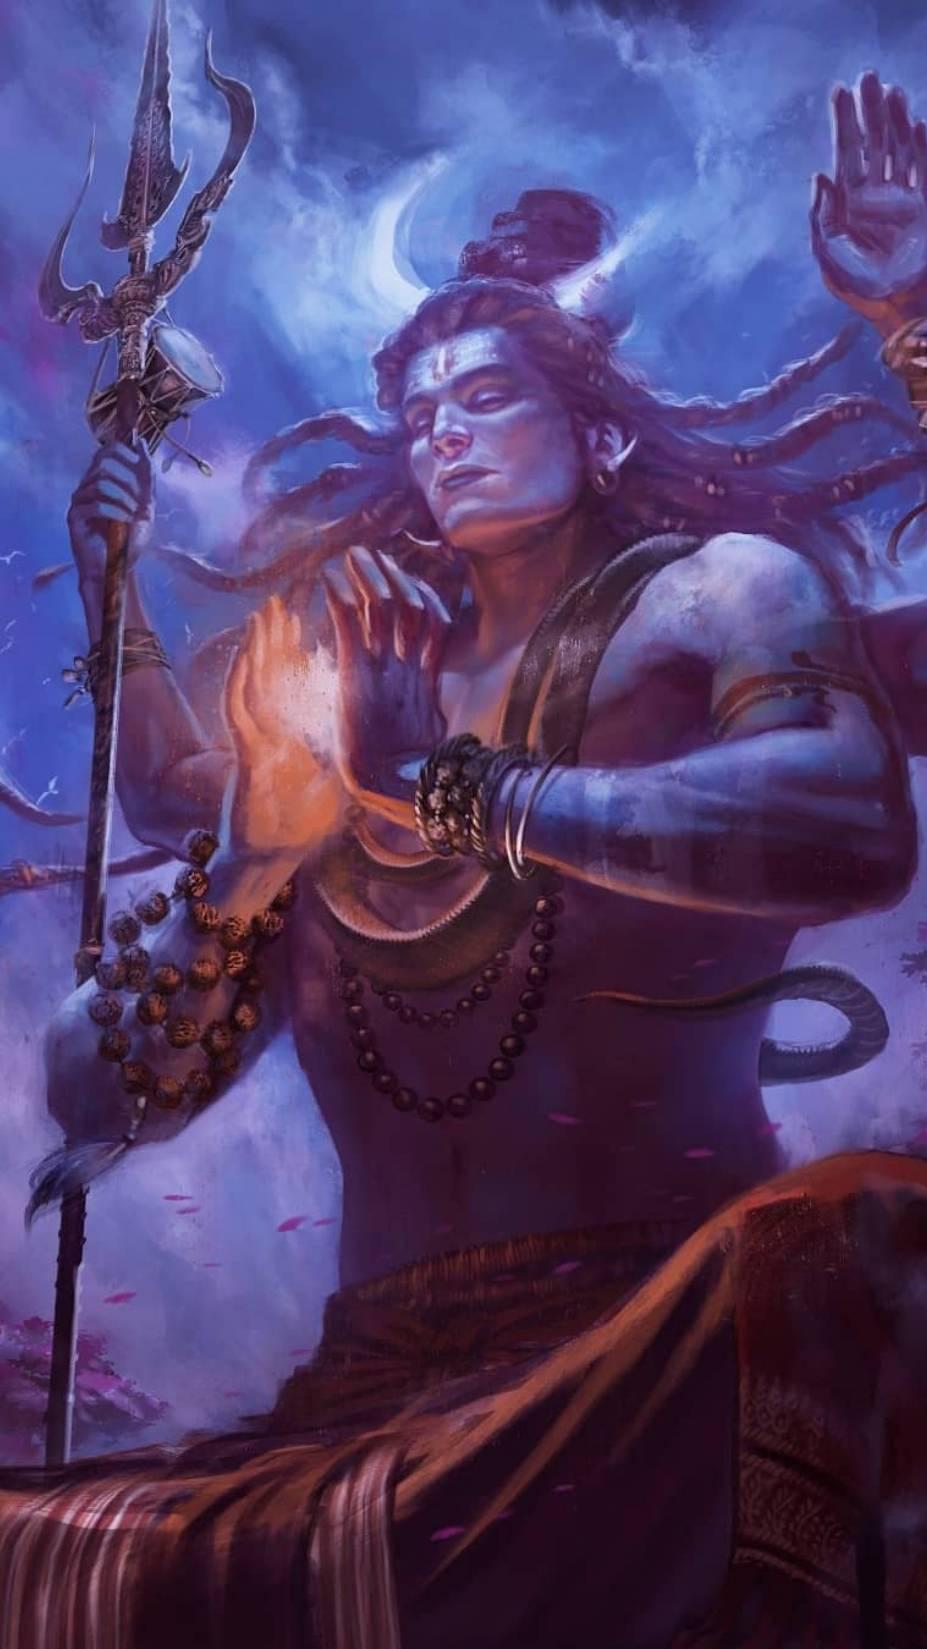 Vishnu Wallpaper Download